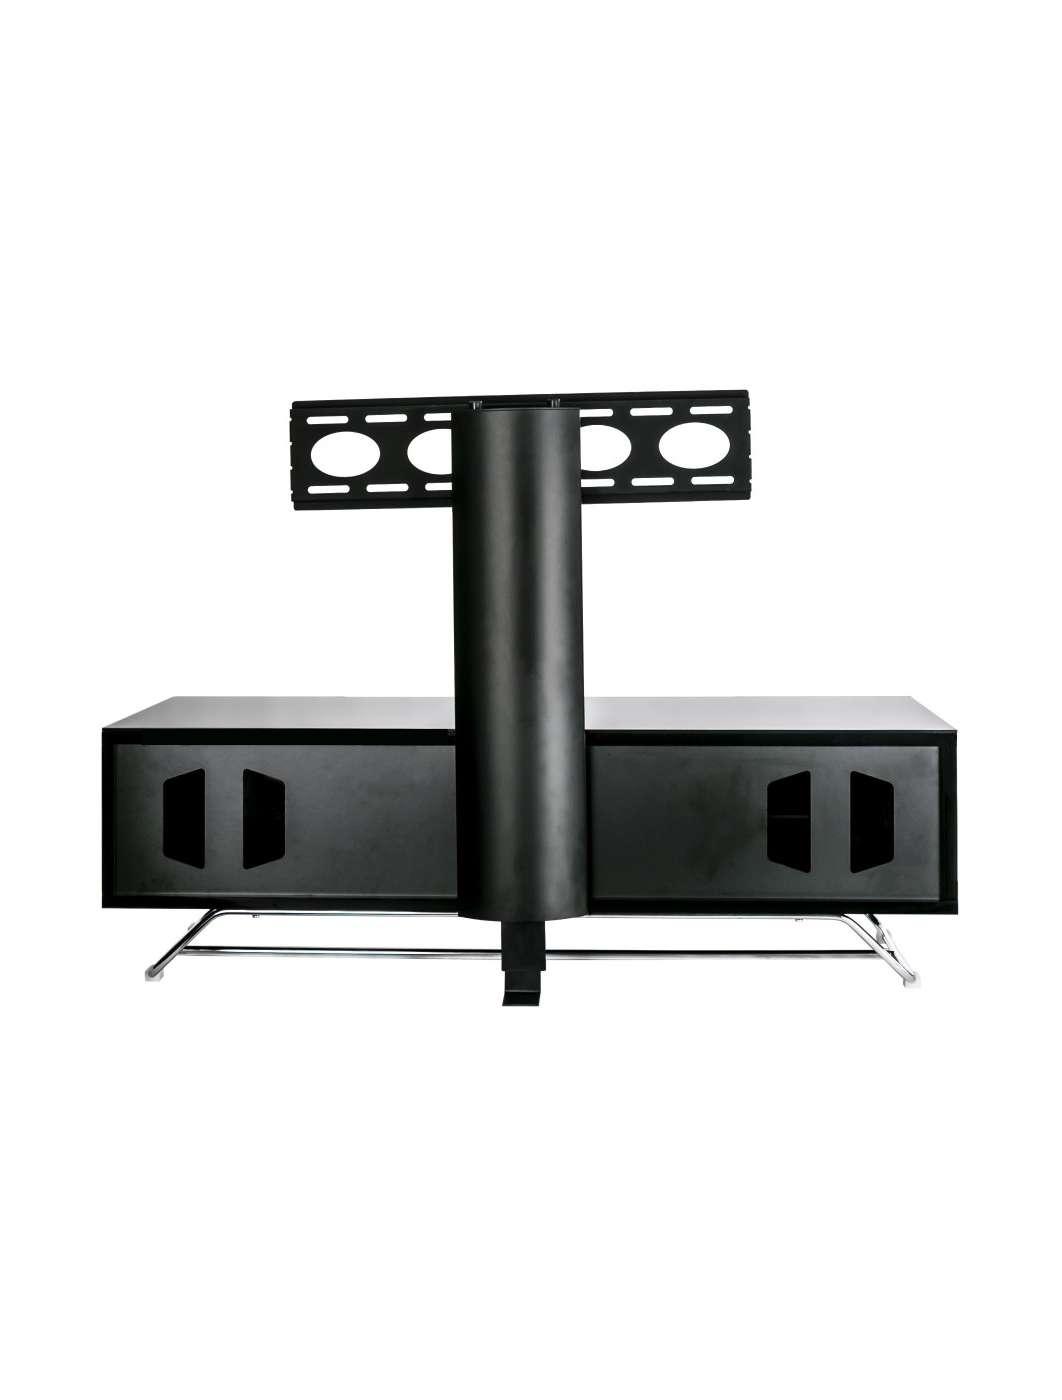 Alphason Chromium Cantilever Tv Stand Cro2 1200bkt Bk | 121 Tv Mounts Regarding White Cantilever Tv Stands (View 3 of 20)